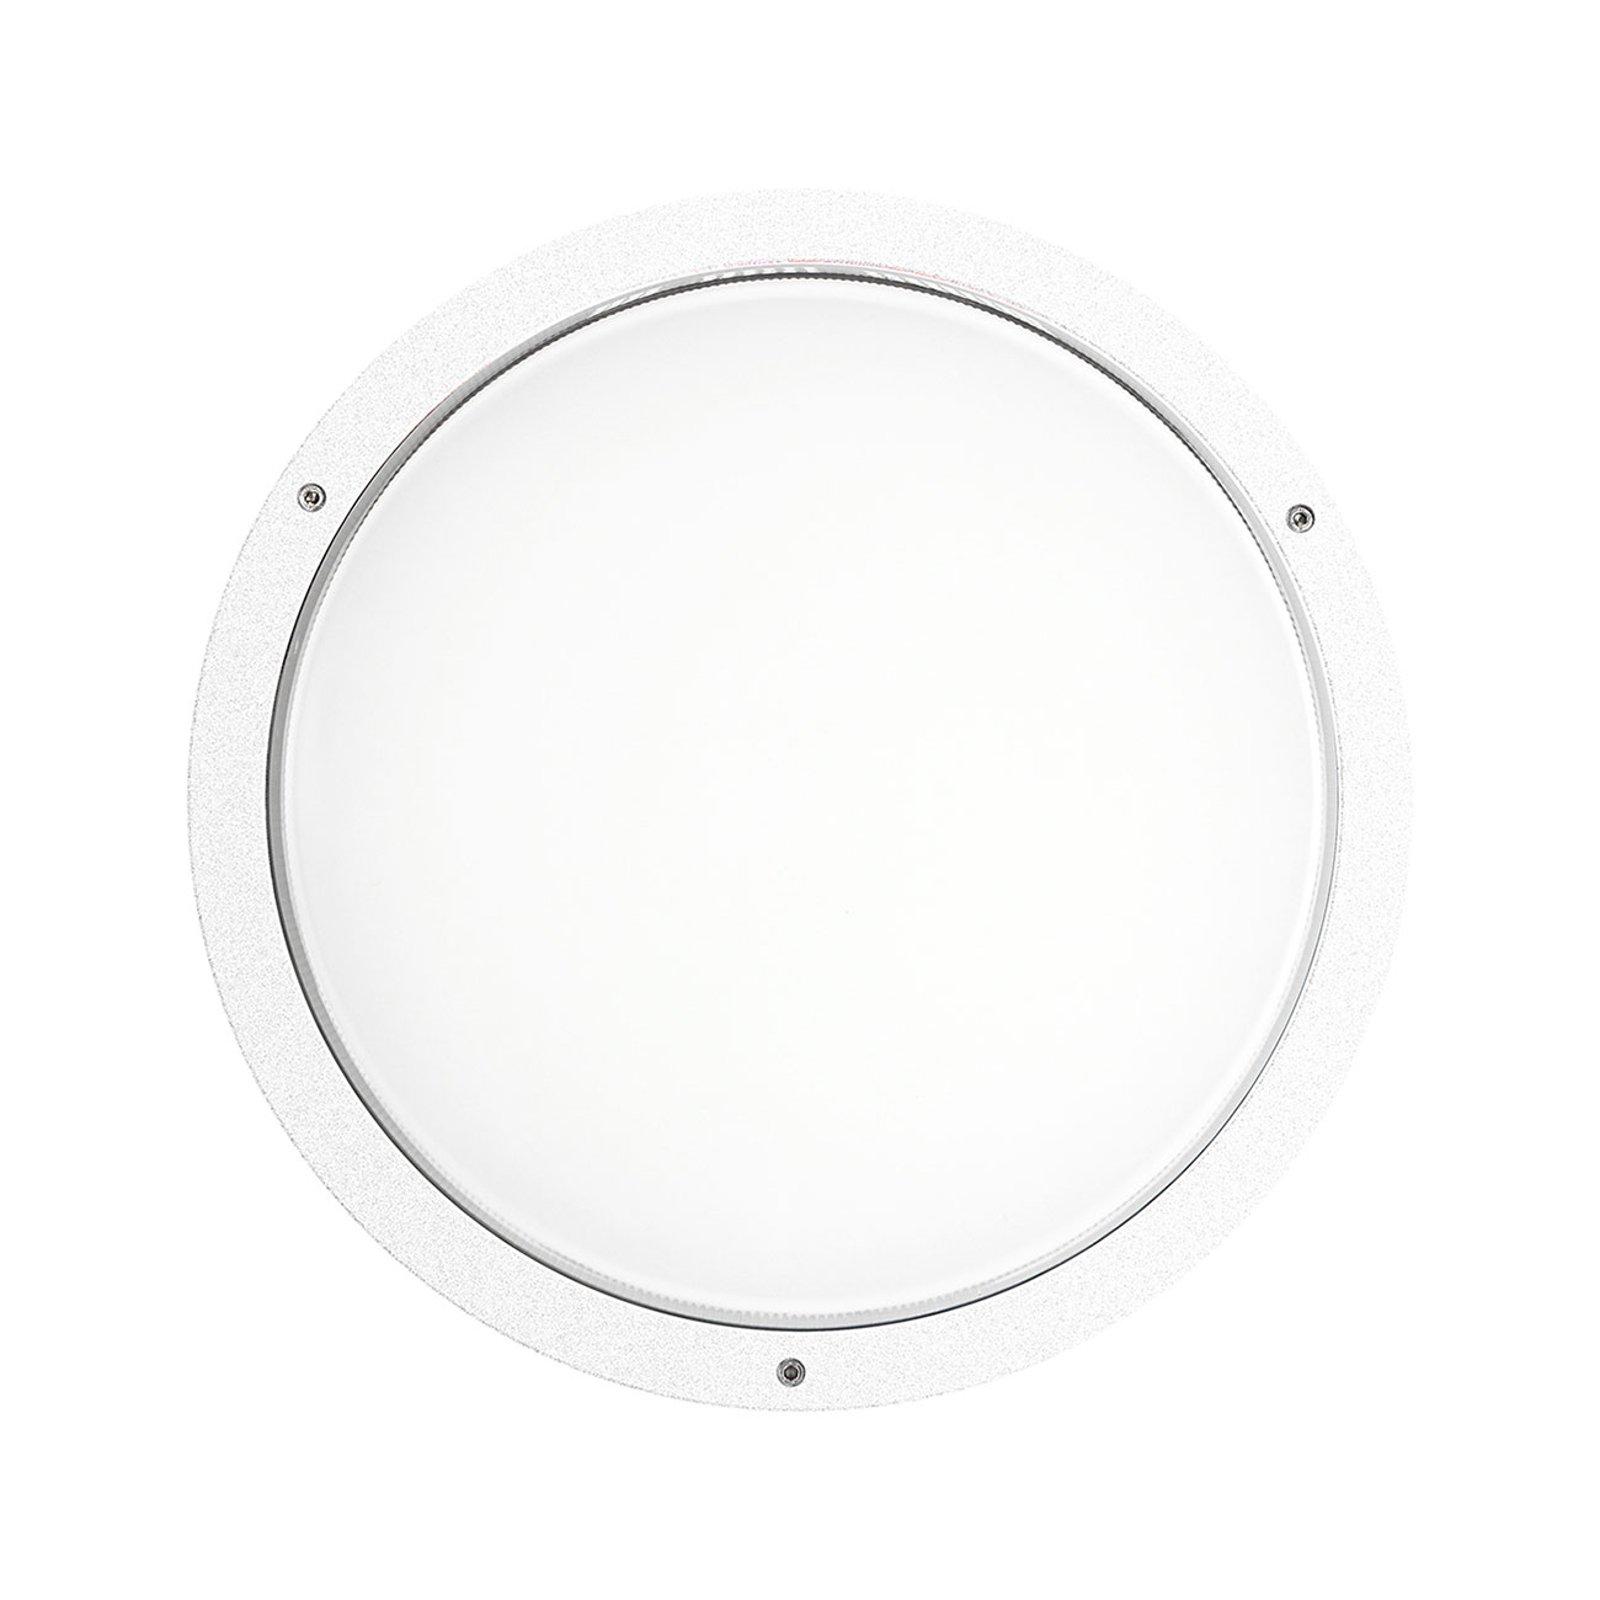 Vegglampe Bliz Round 40 3 000 K, hvit dimbar